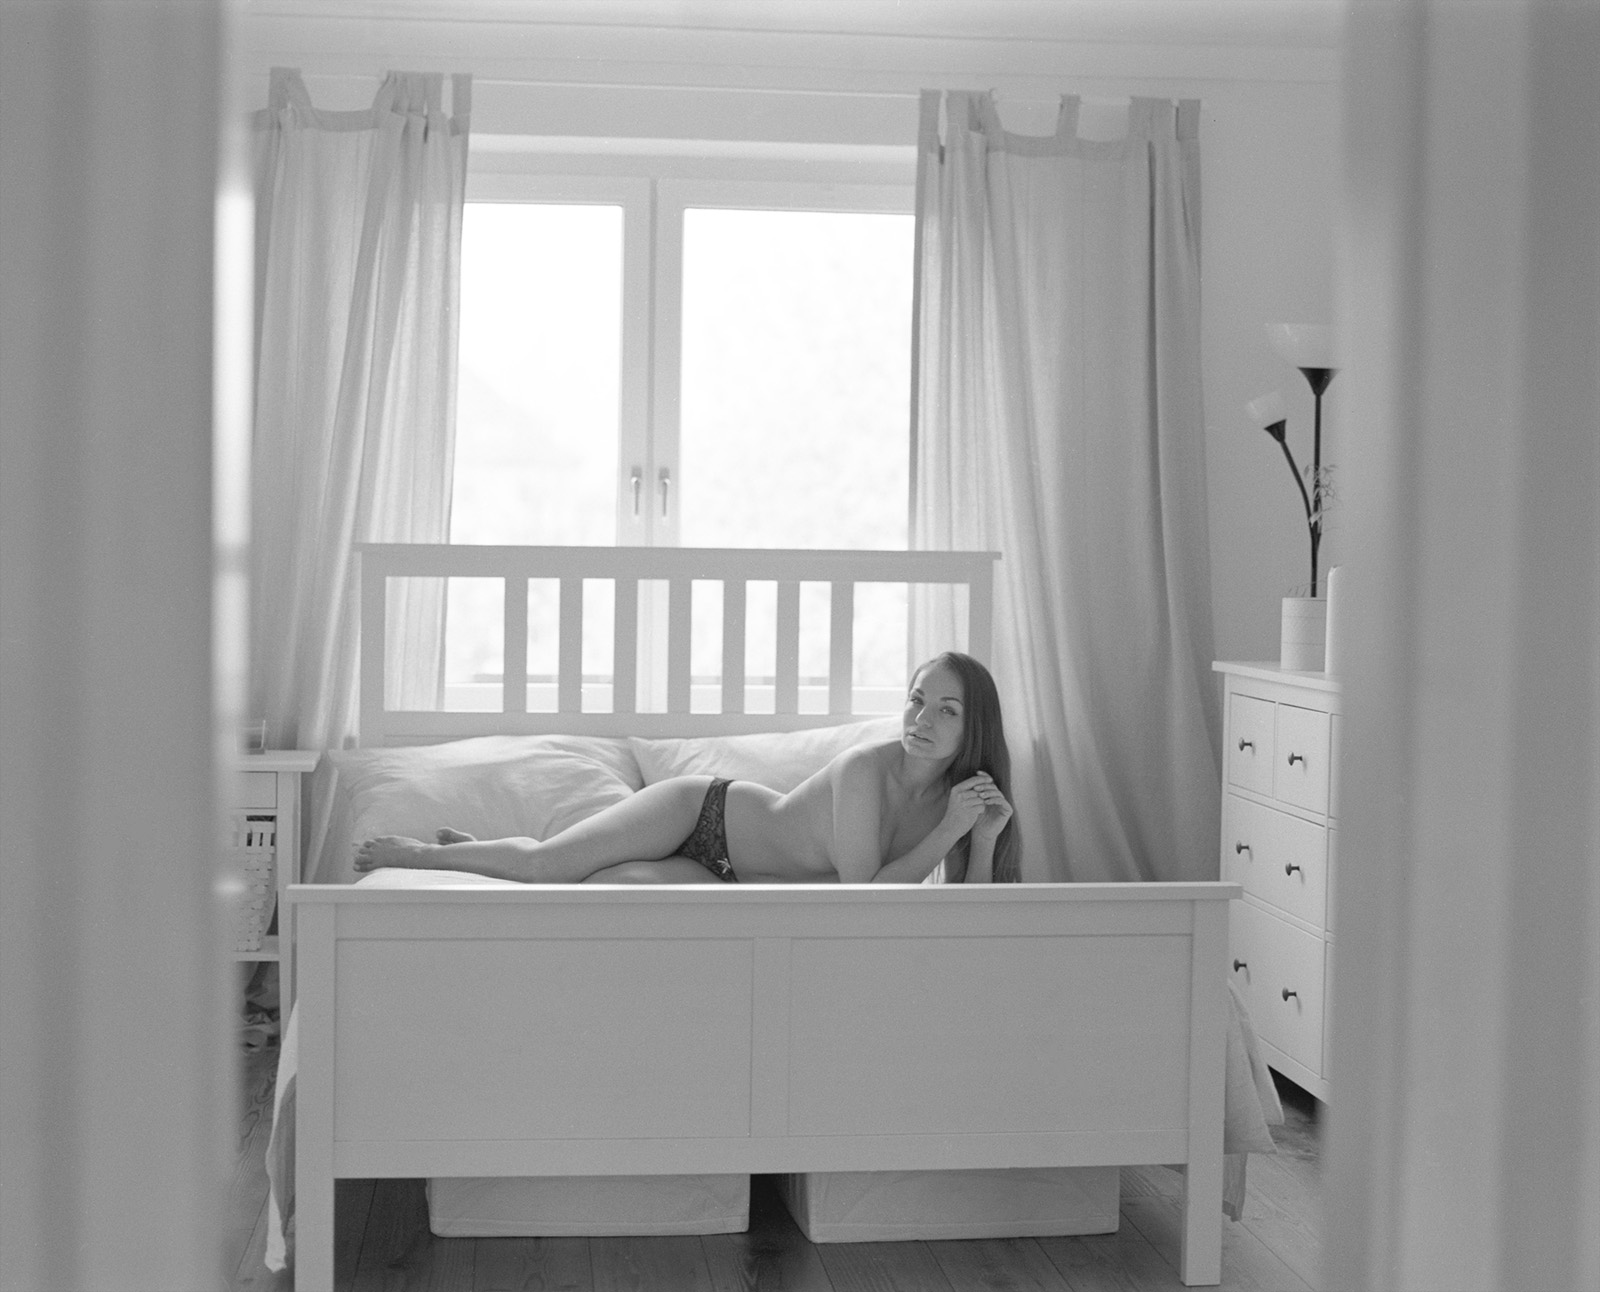 Anastasia auf ihrem Bett Akt Erotik Boudoir Fotograf sexy Homeshooting nackt